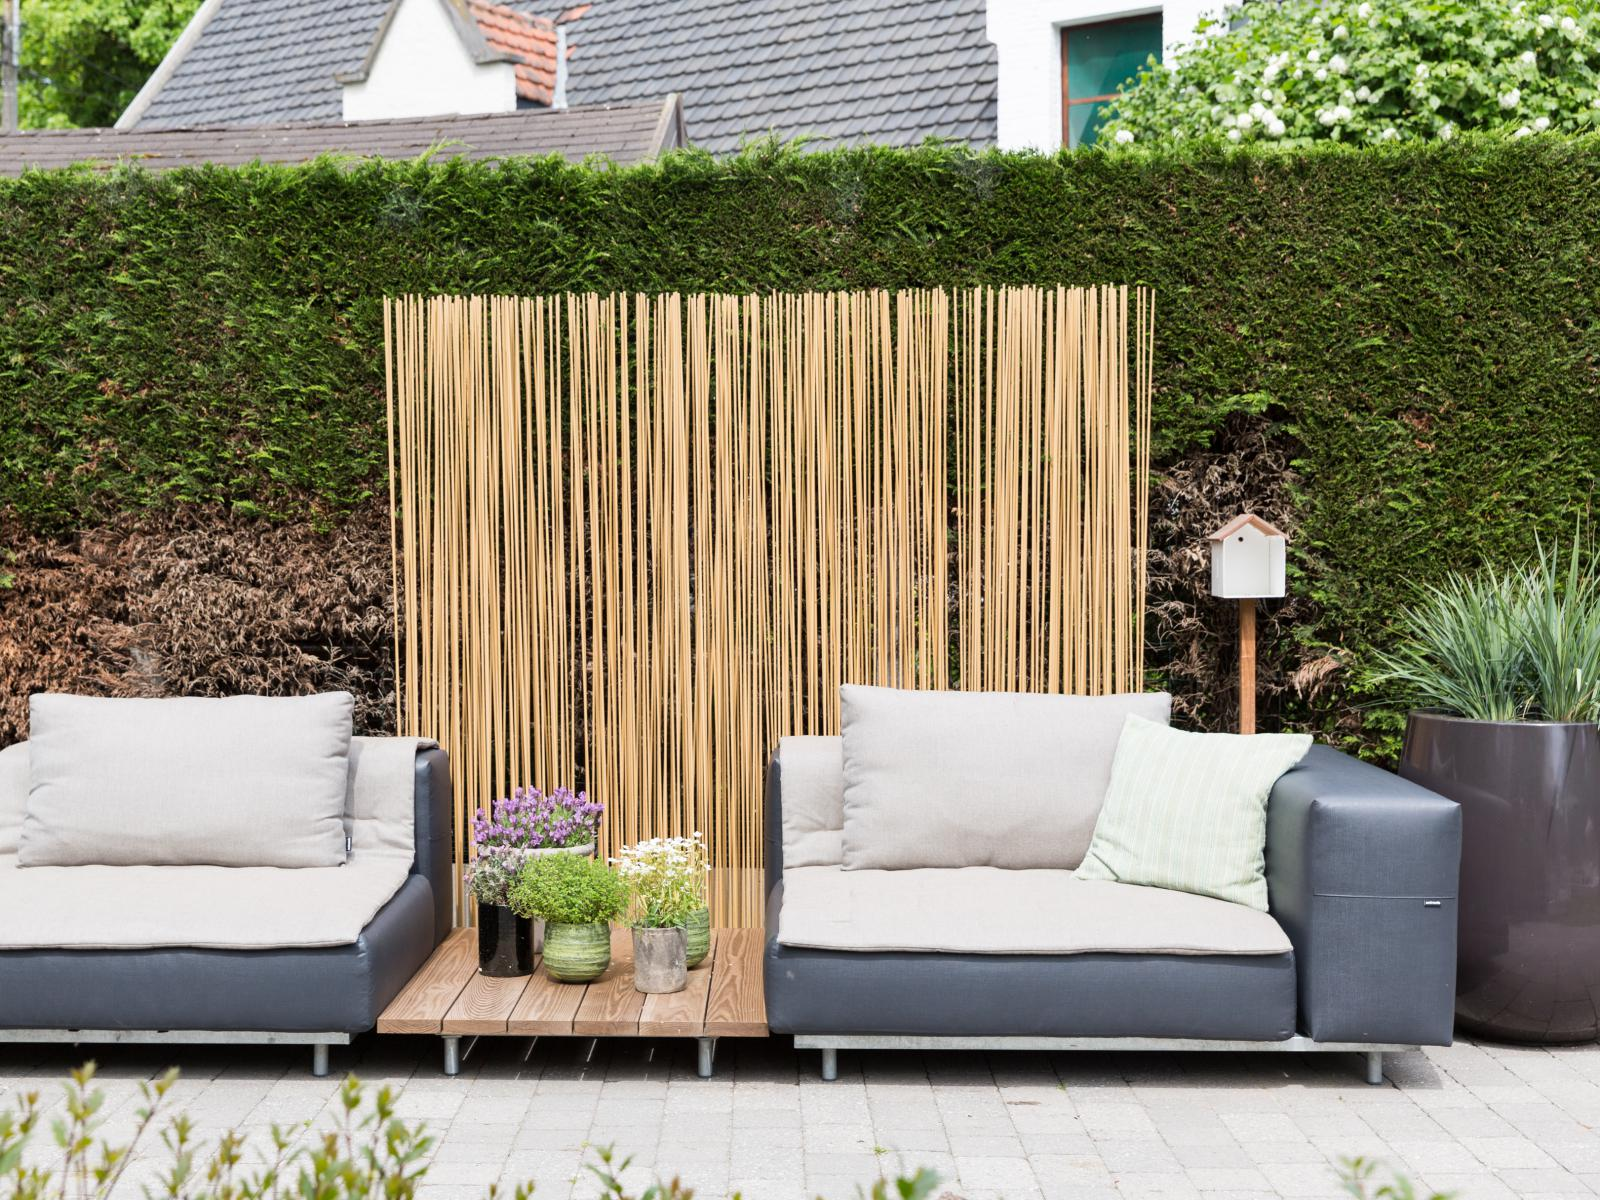 feelathome stockverkoop extremis sticks hout kleurig. Black Bedroom Furniture Sets. Home Design Ideas